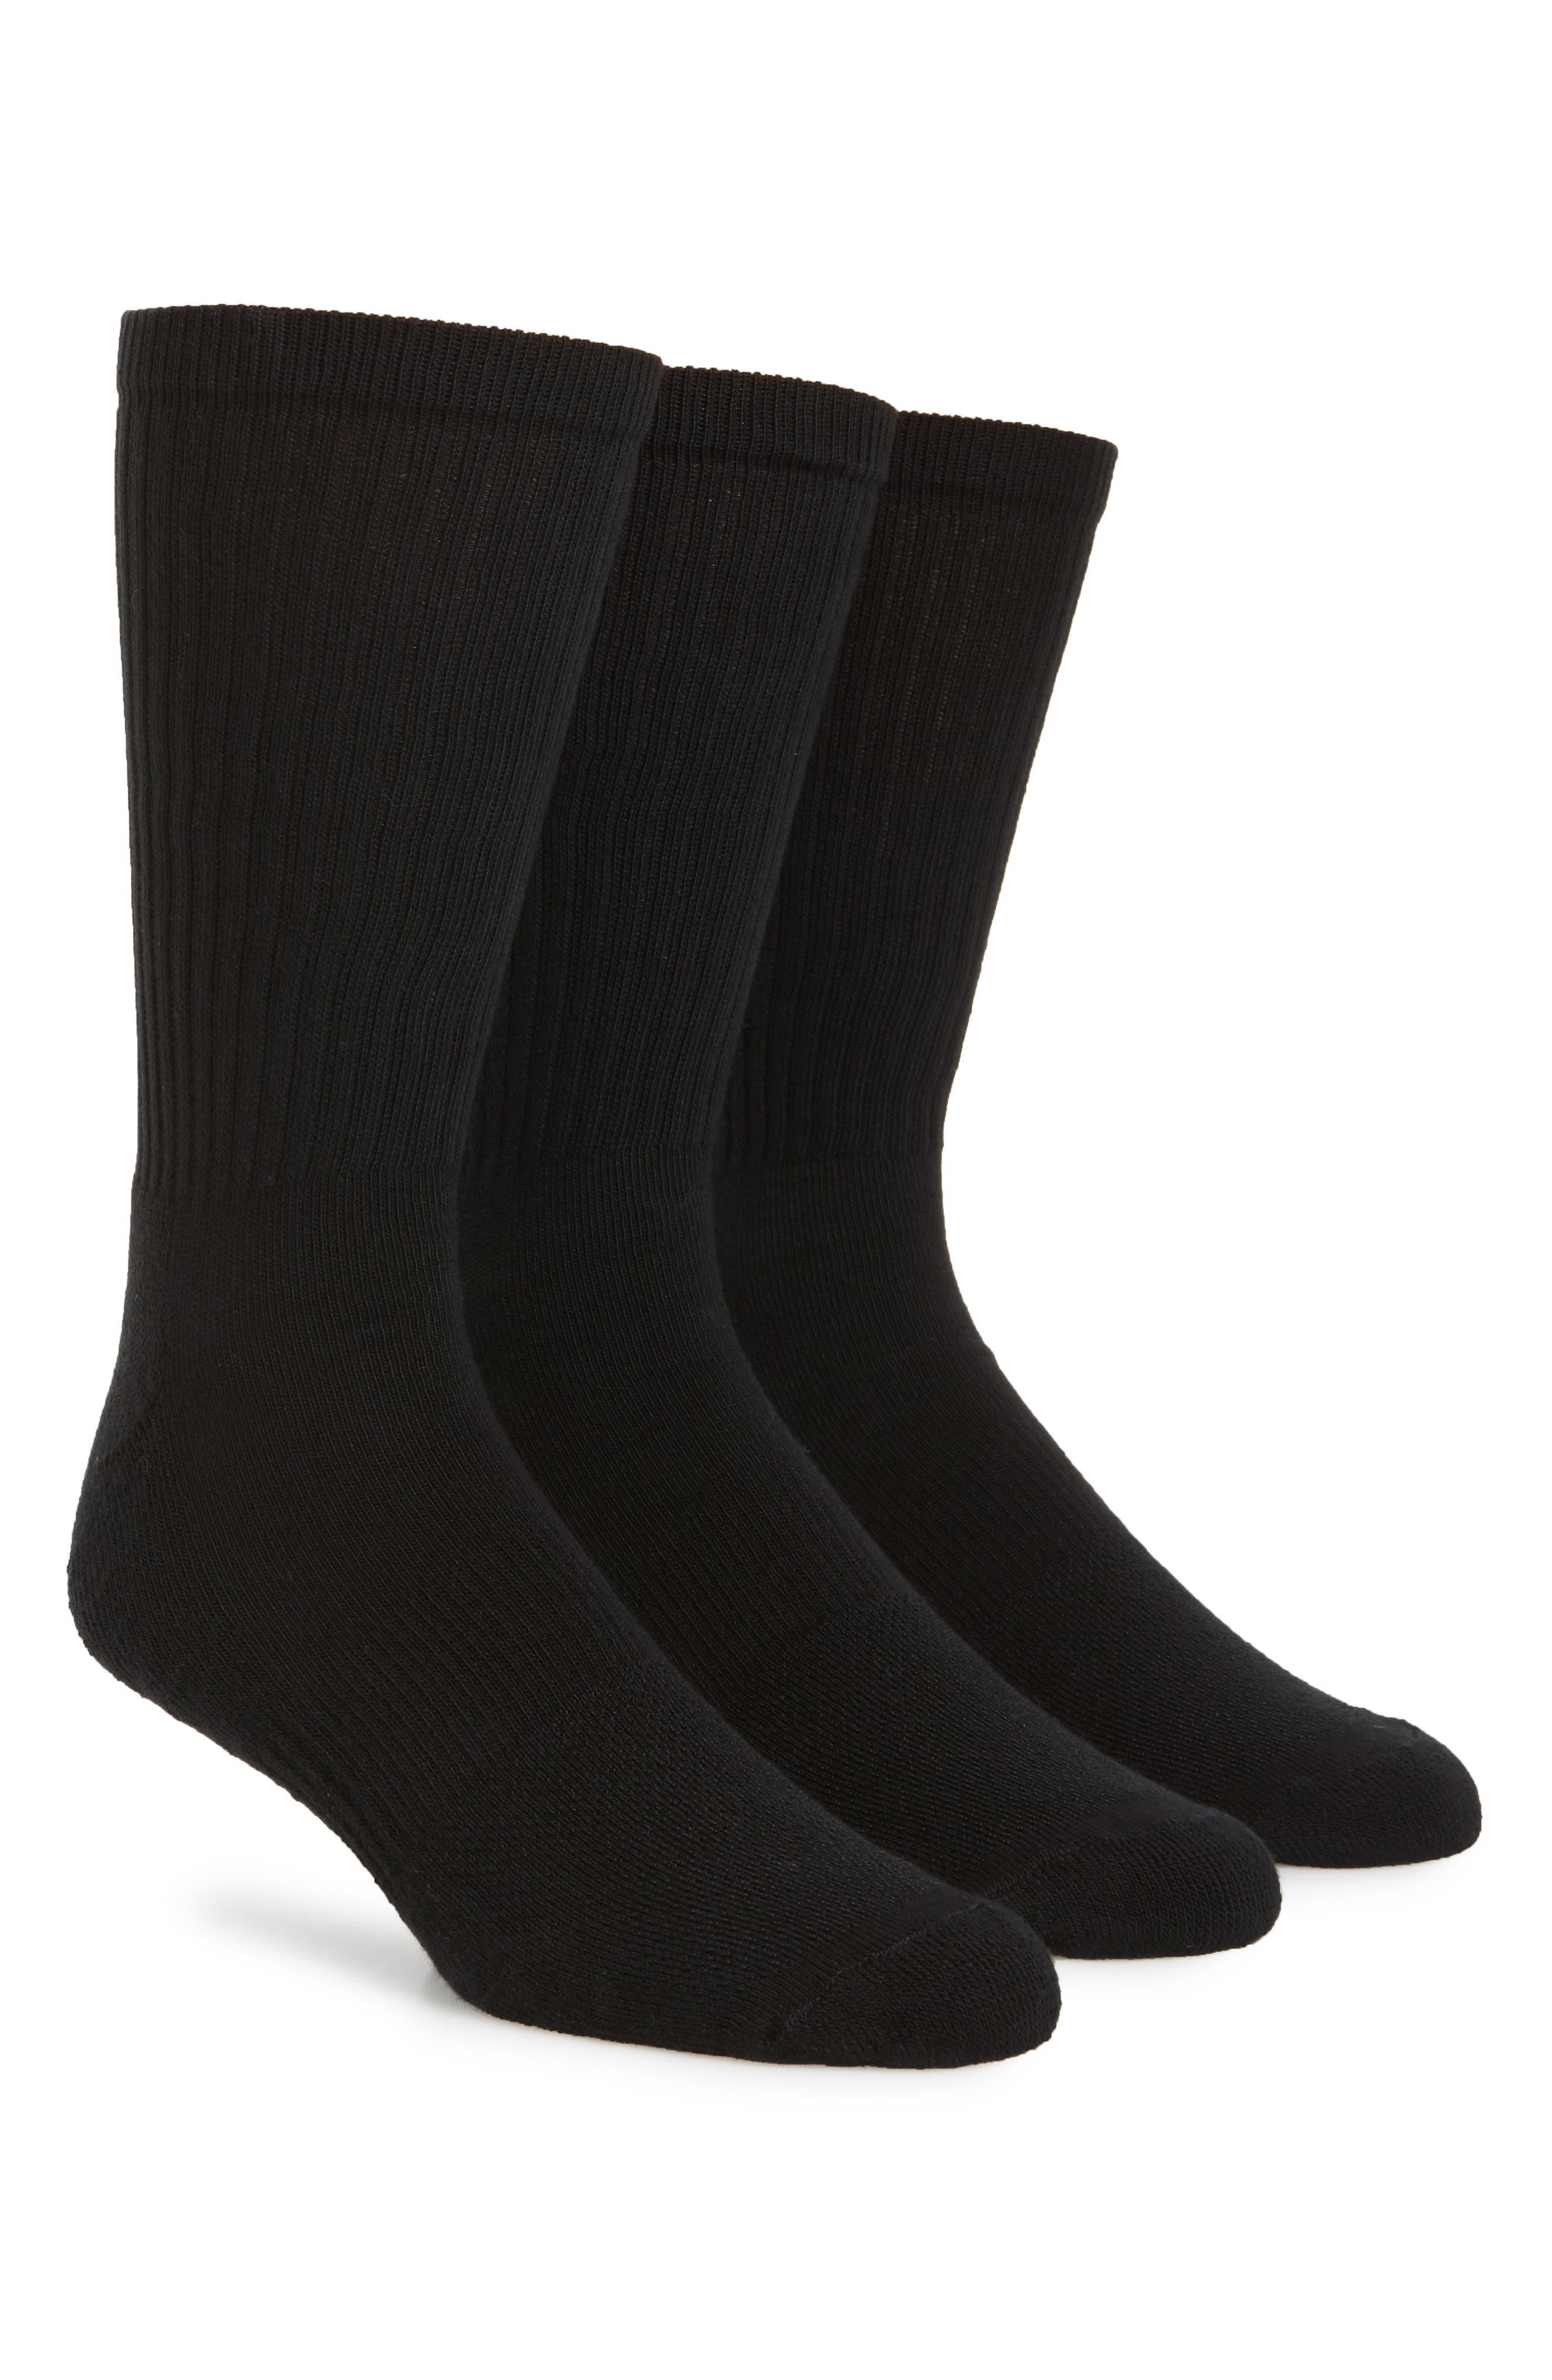 Main Image - Nordstrom Men's Shop 3-Pack Crew Cut Athletic Socks (King Size)